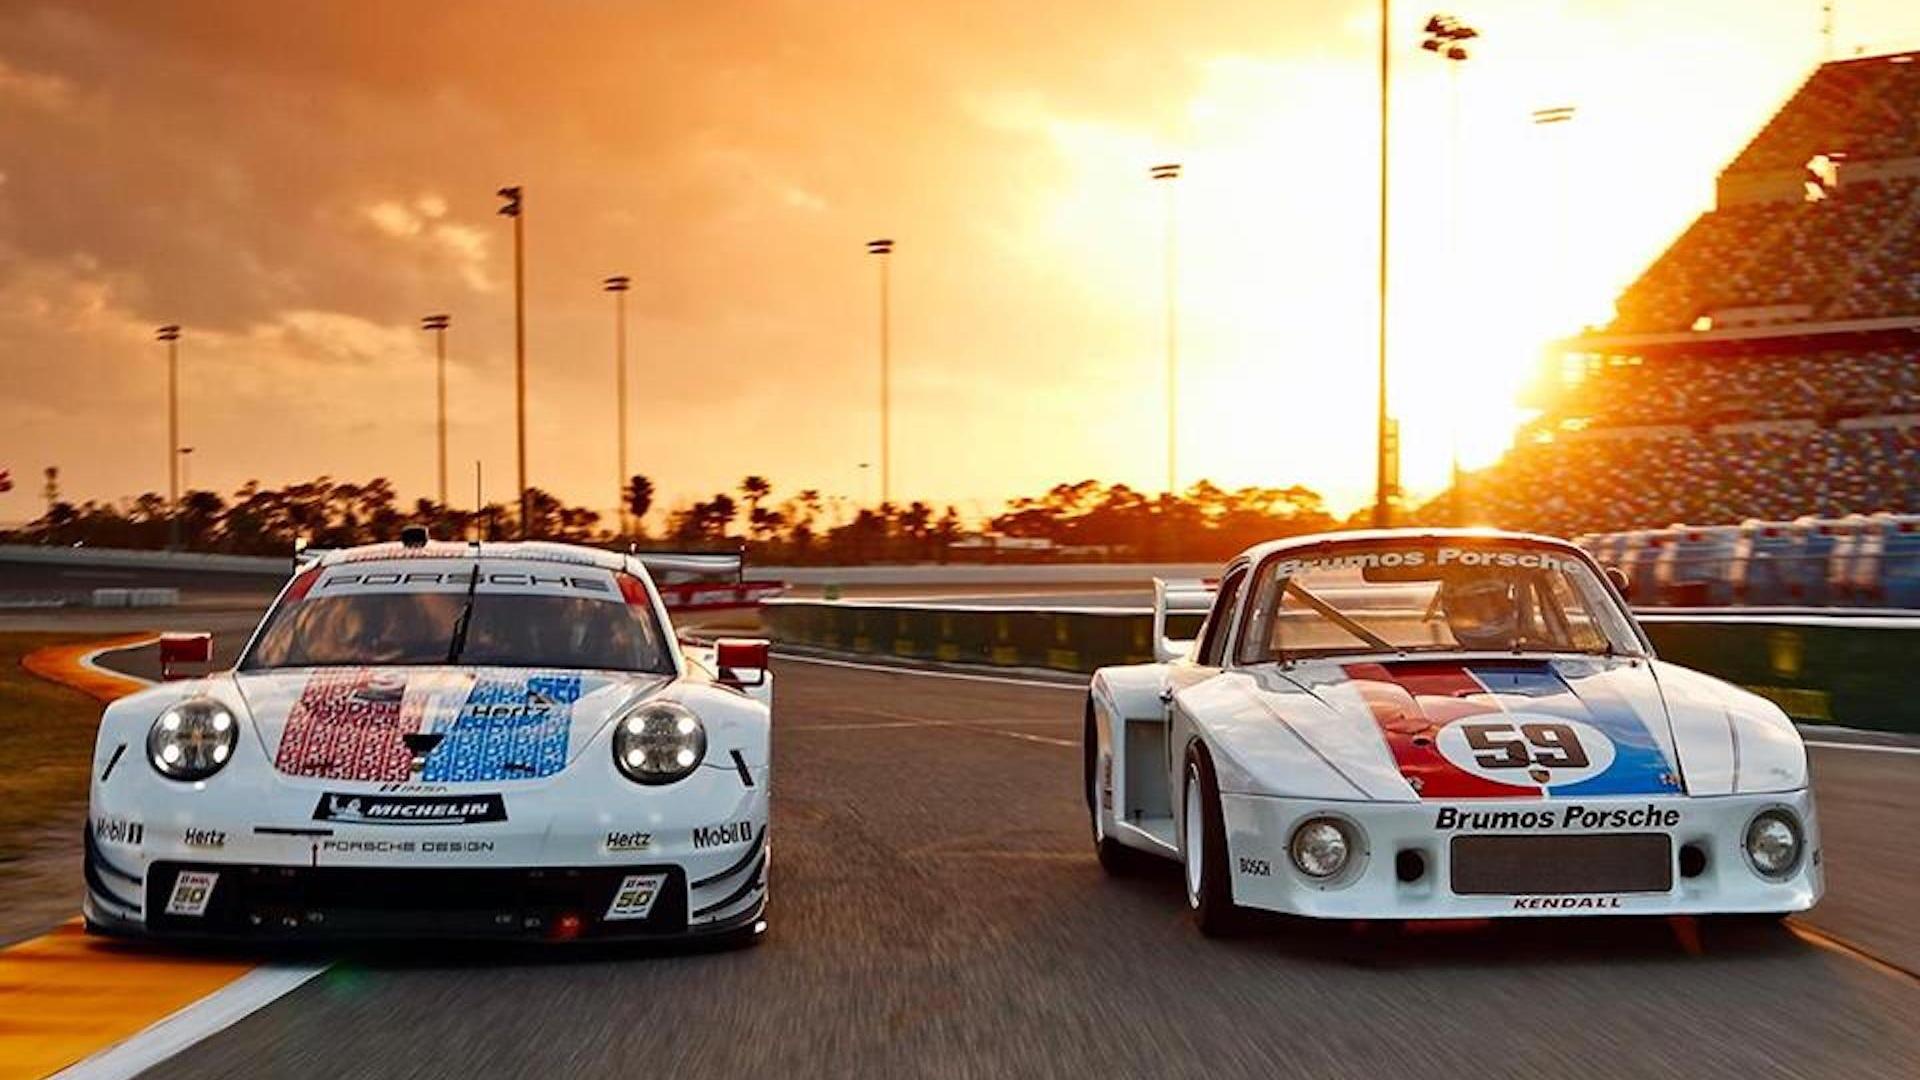 Porsche 911 RSR Brumos racing livery for 2019 Rolex 24 at Daytona